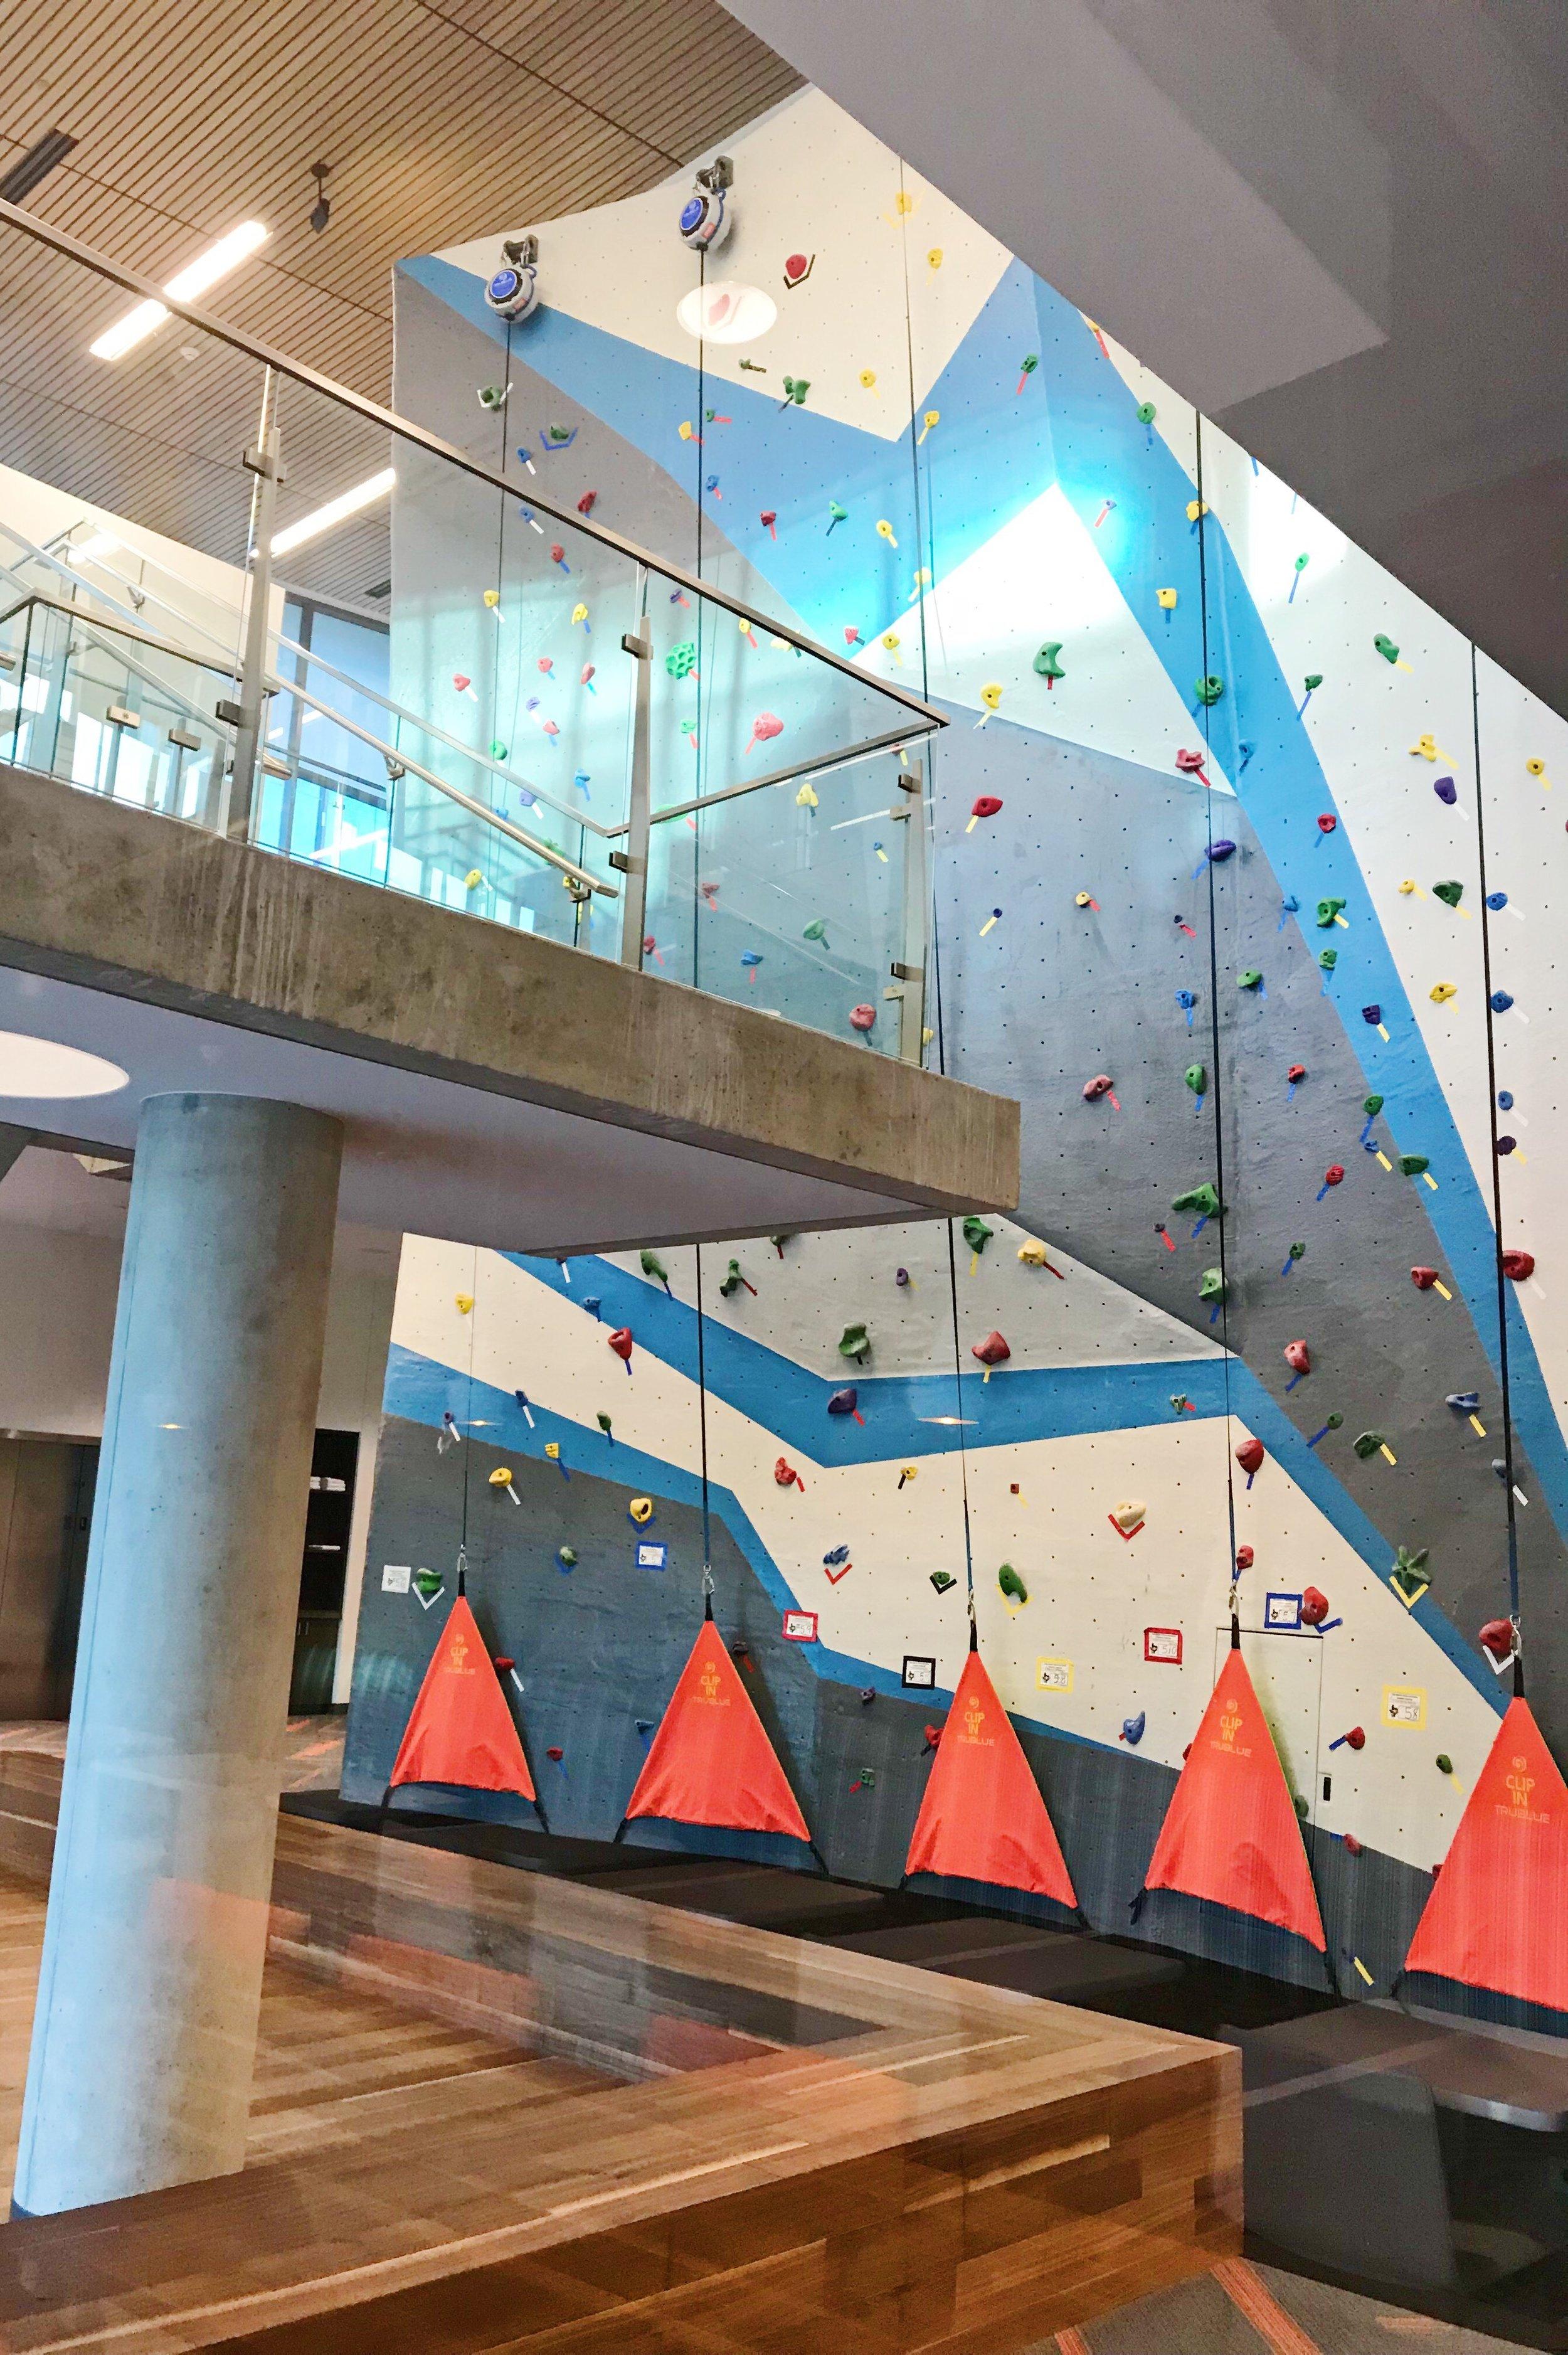 2-story climbing wall.